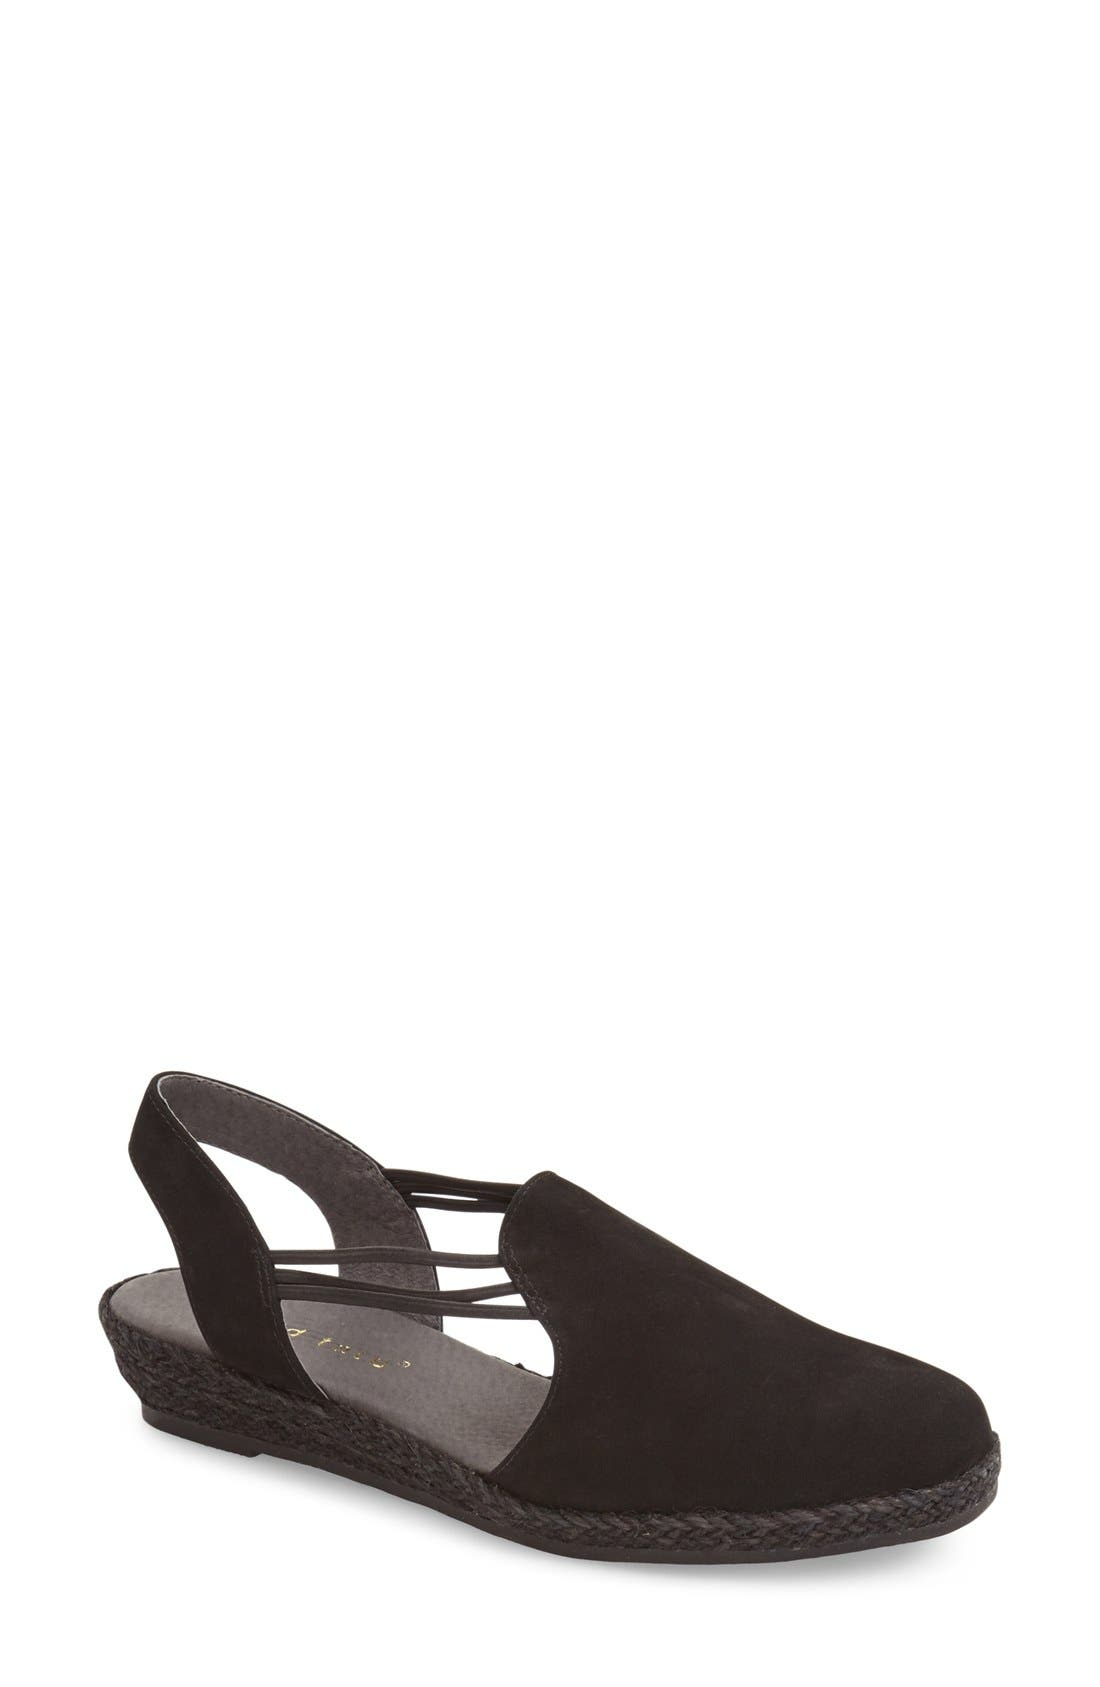 'Nelly' Slingback Wedge Sandal